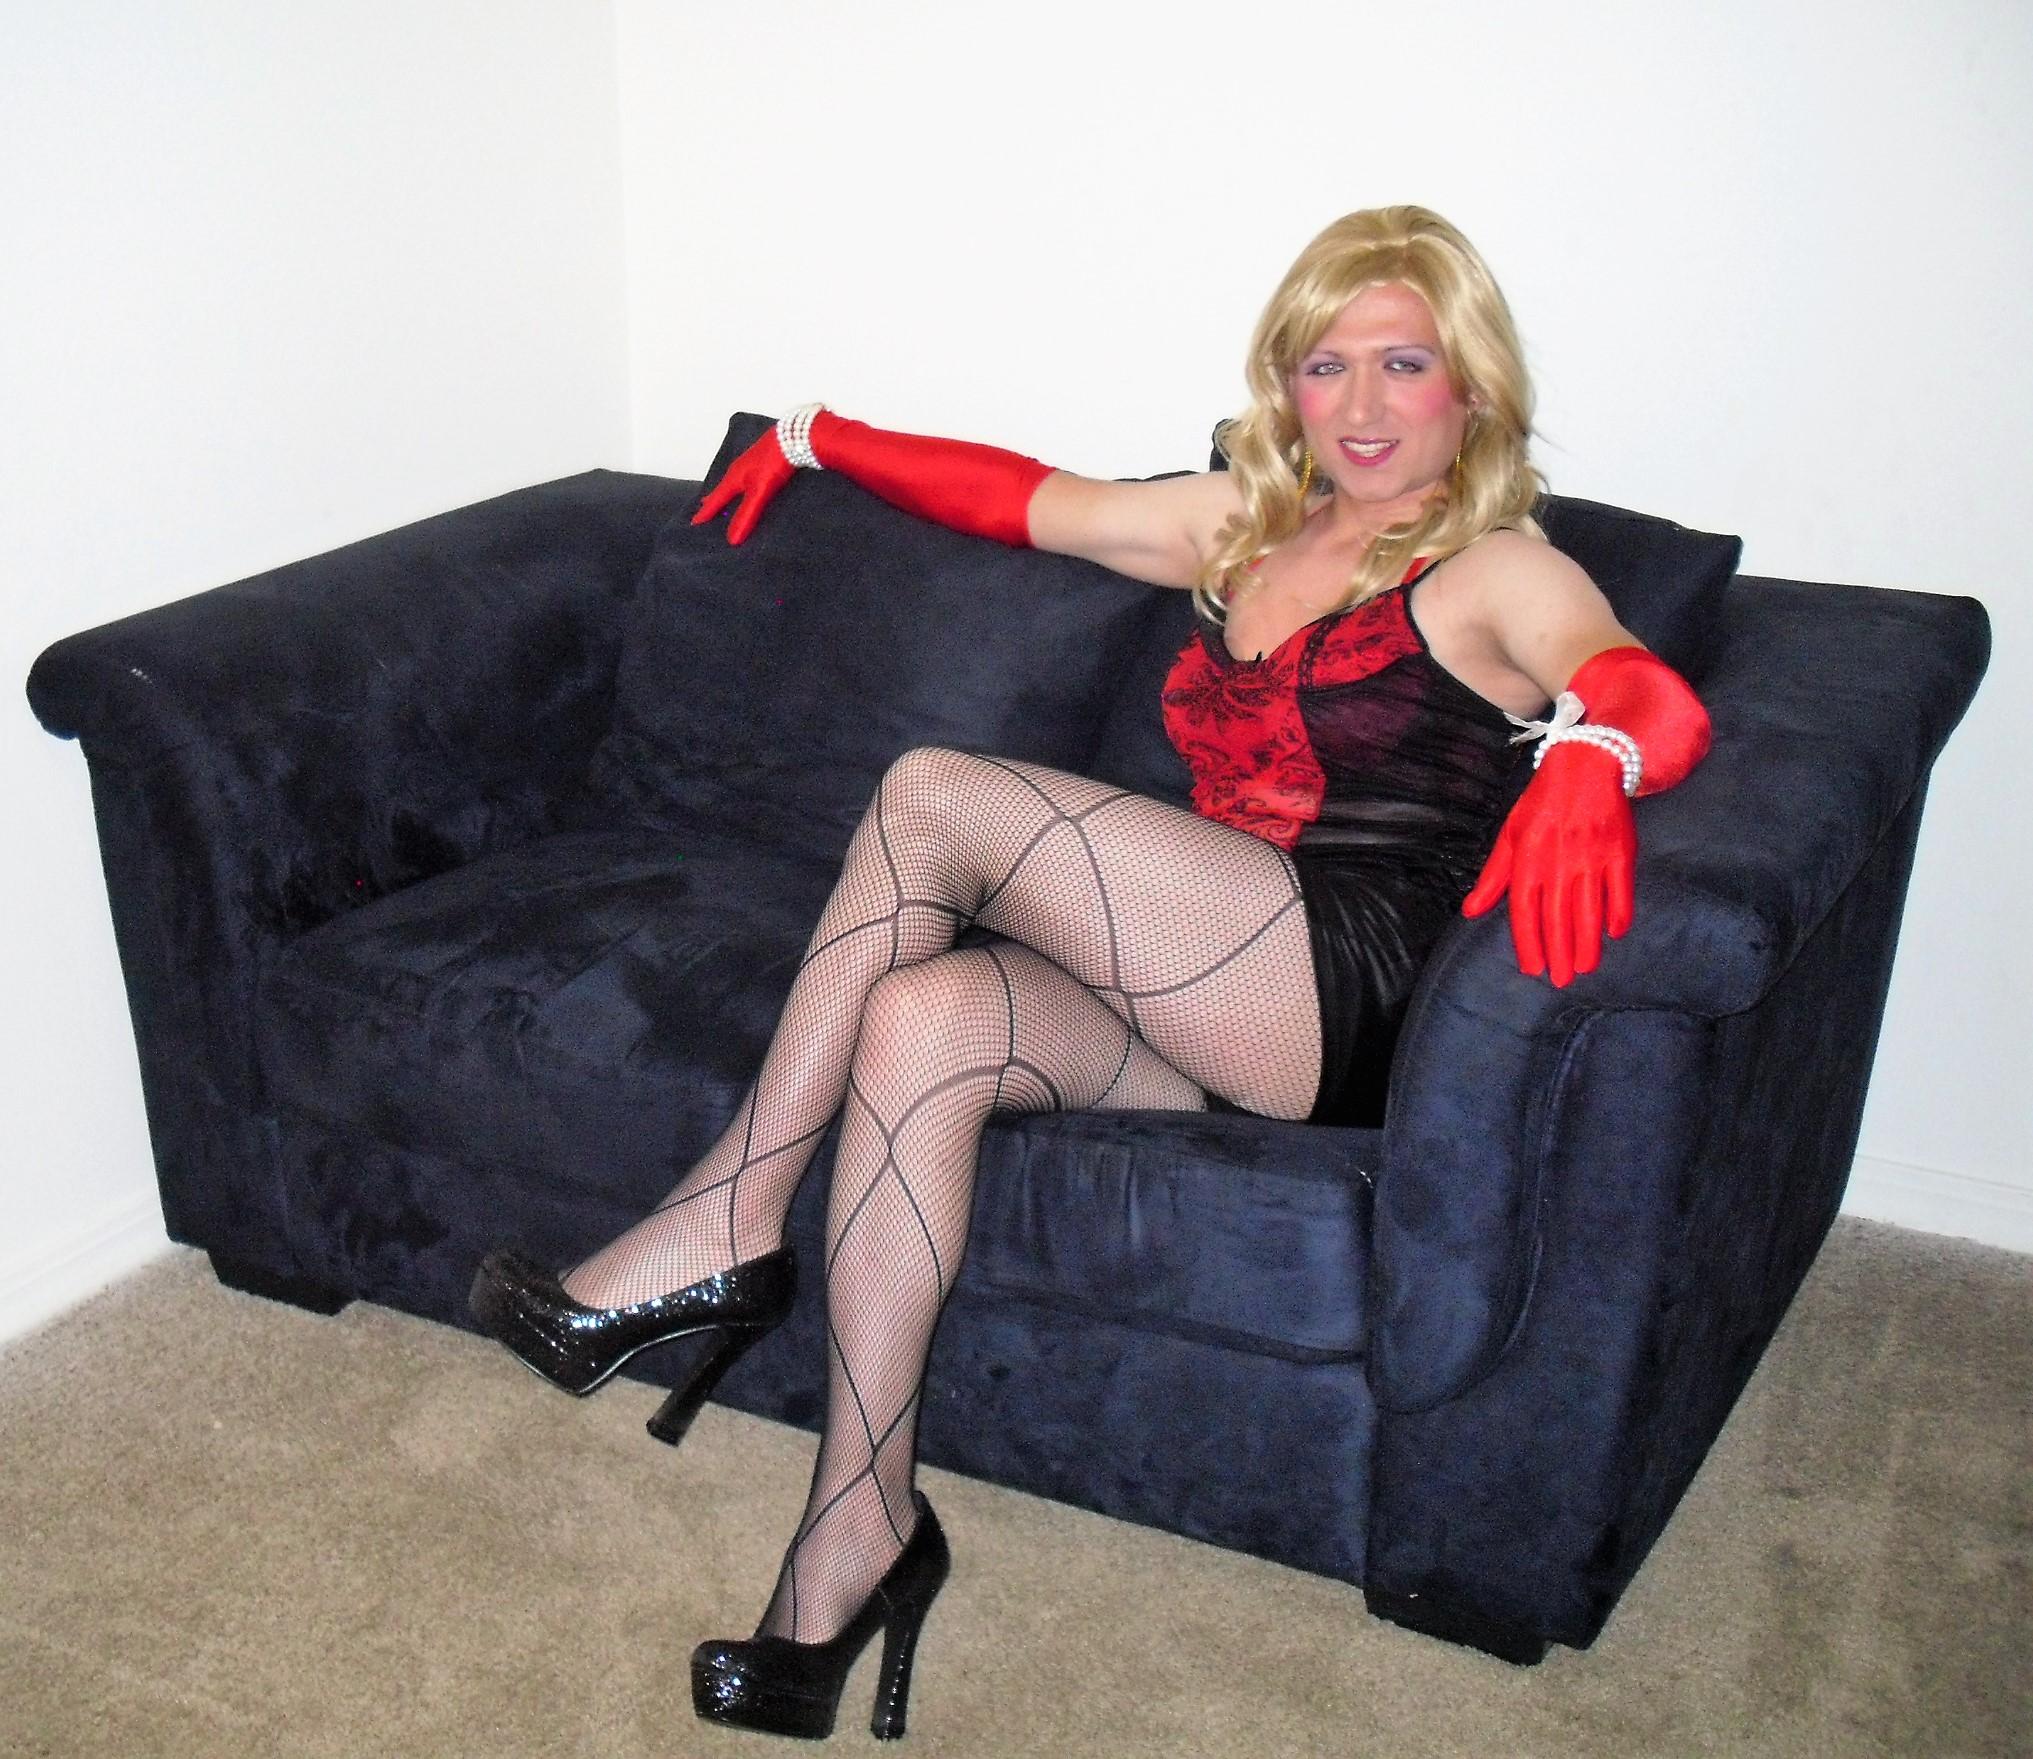 Travestis free pantyhose